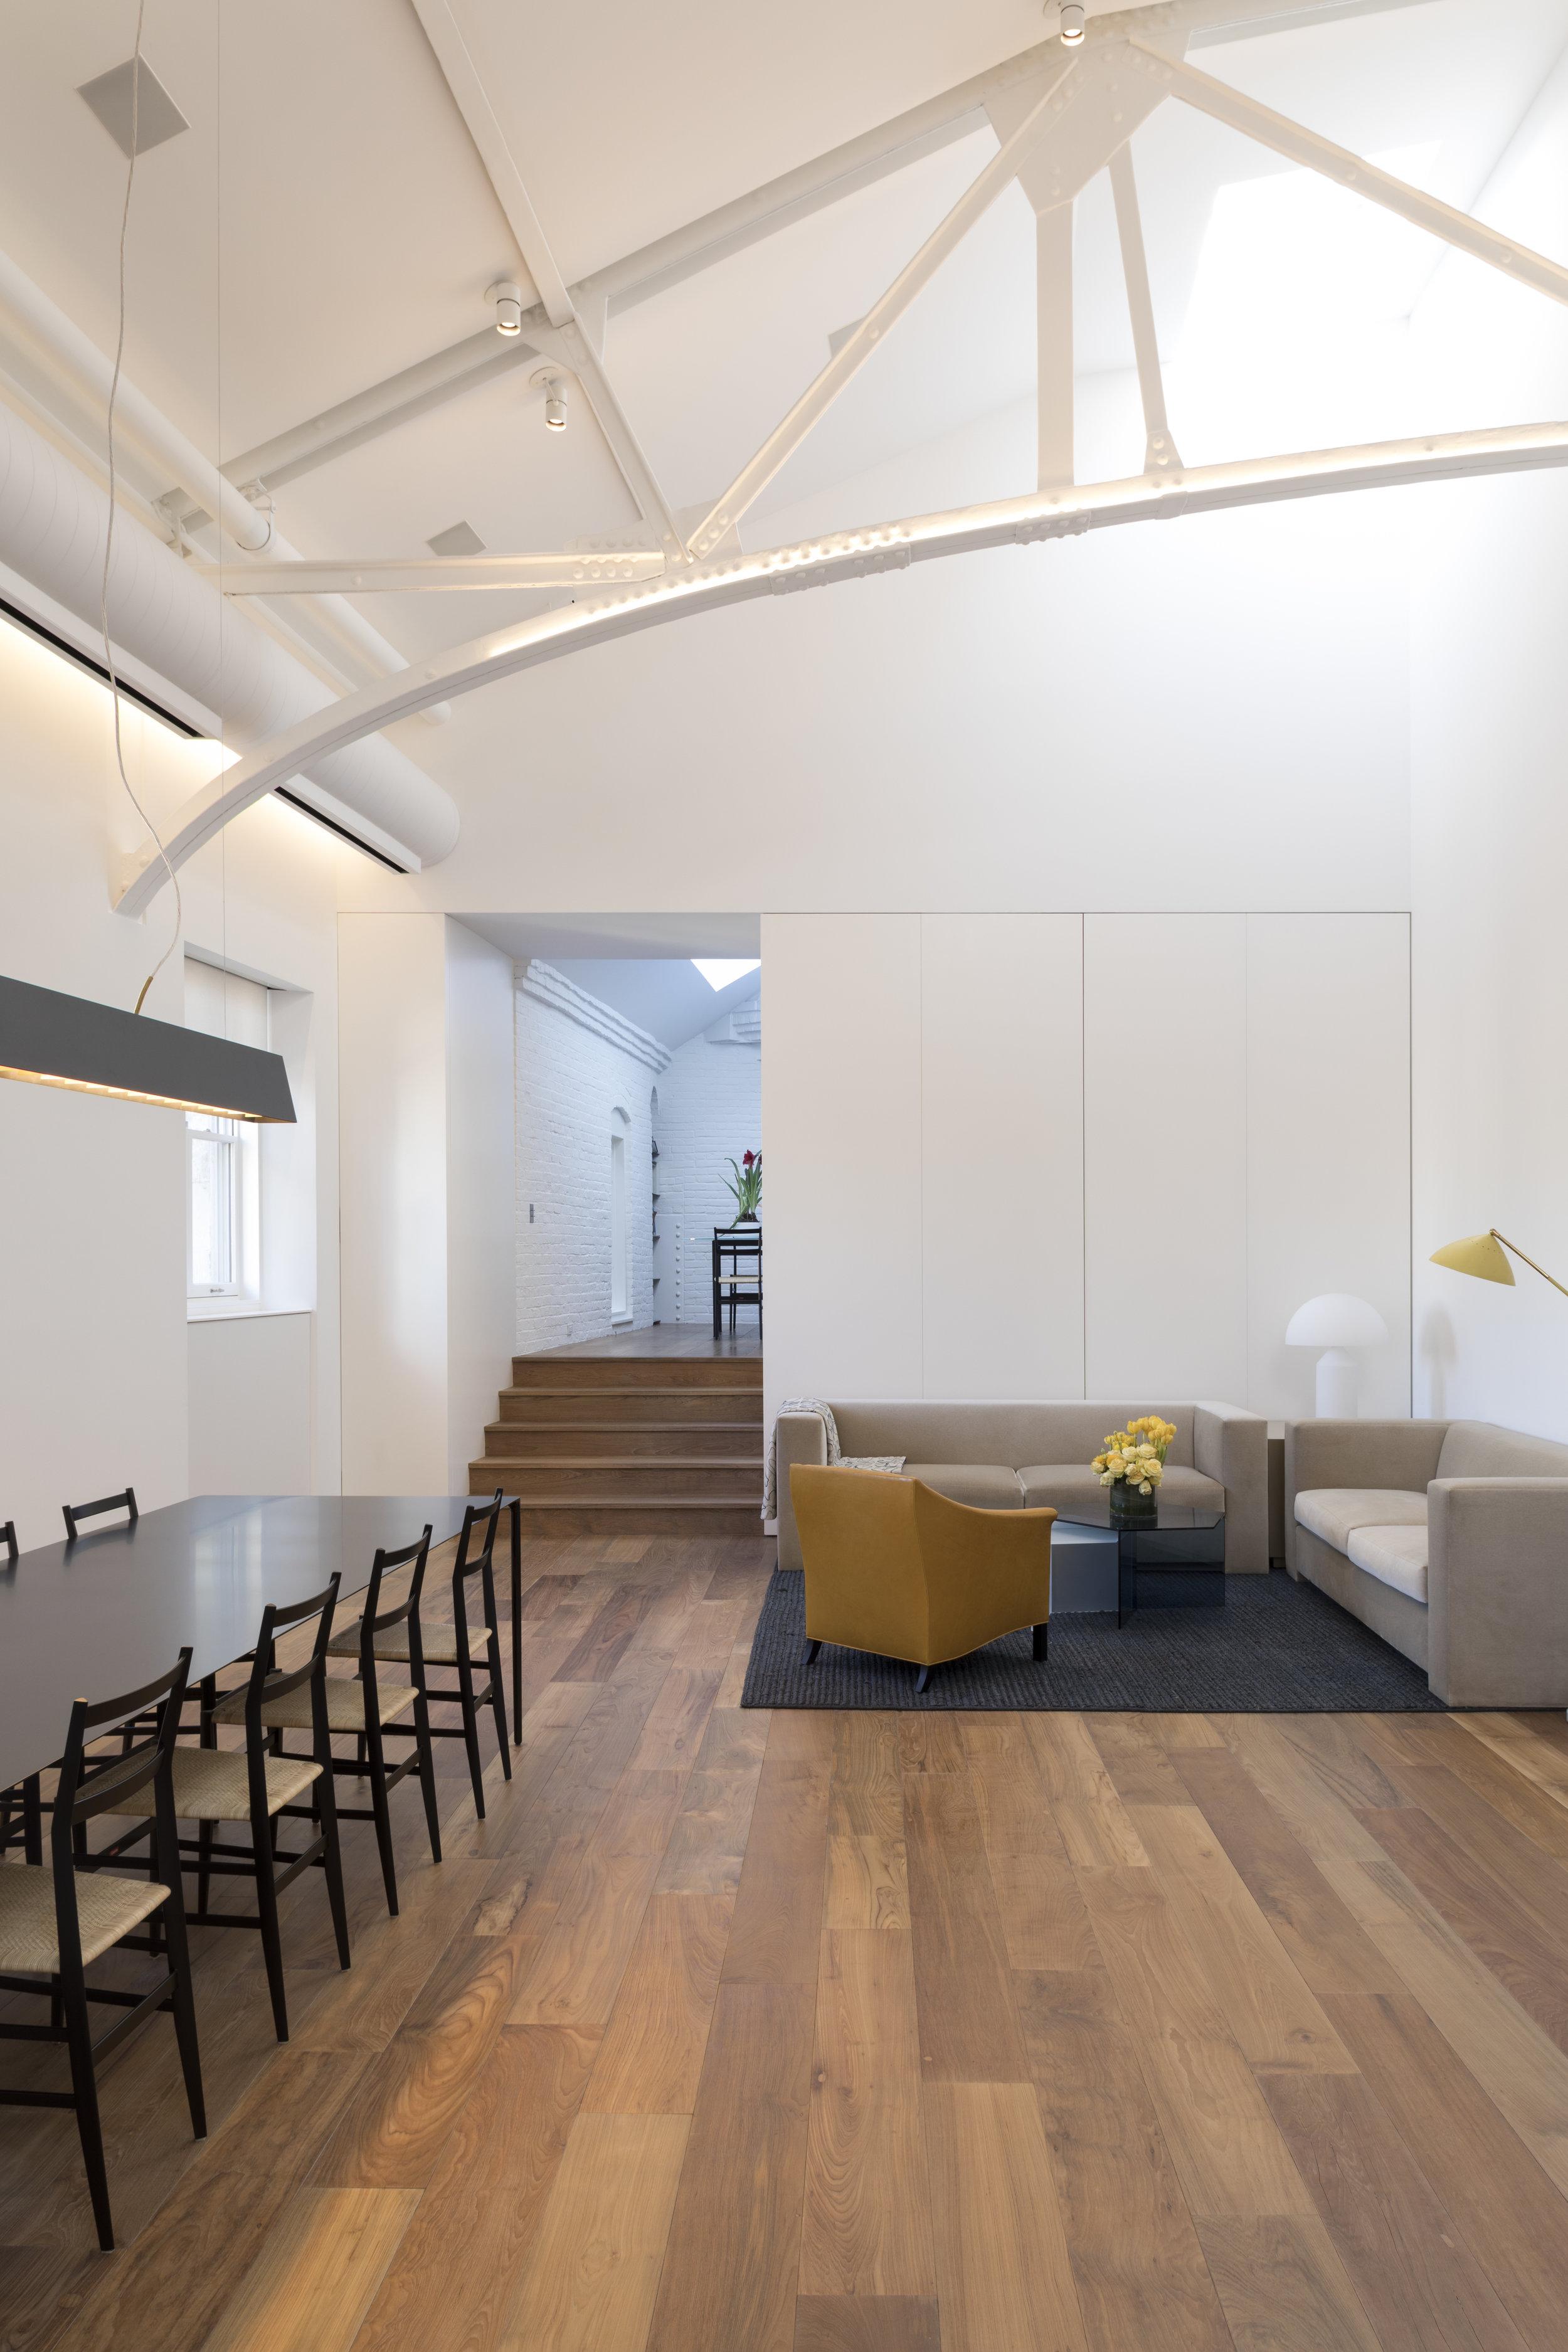 Police-Building-Apartment_Selldorf-Architects_Nicholas-Venezia_01.jpg